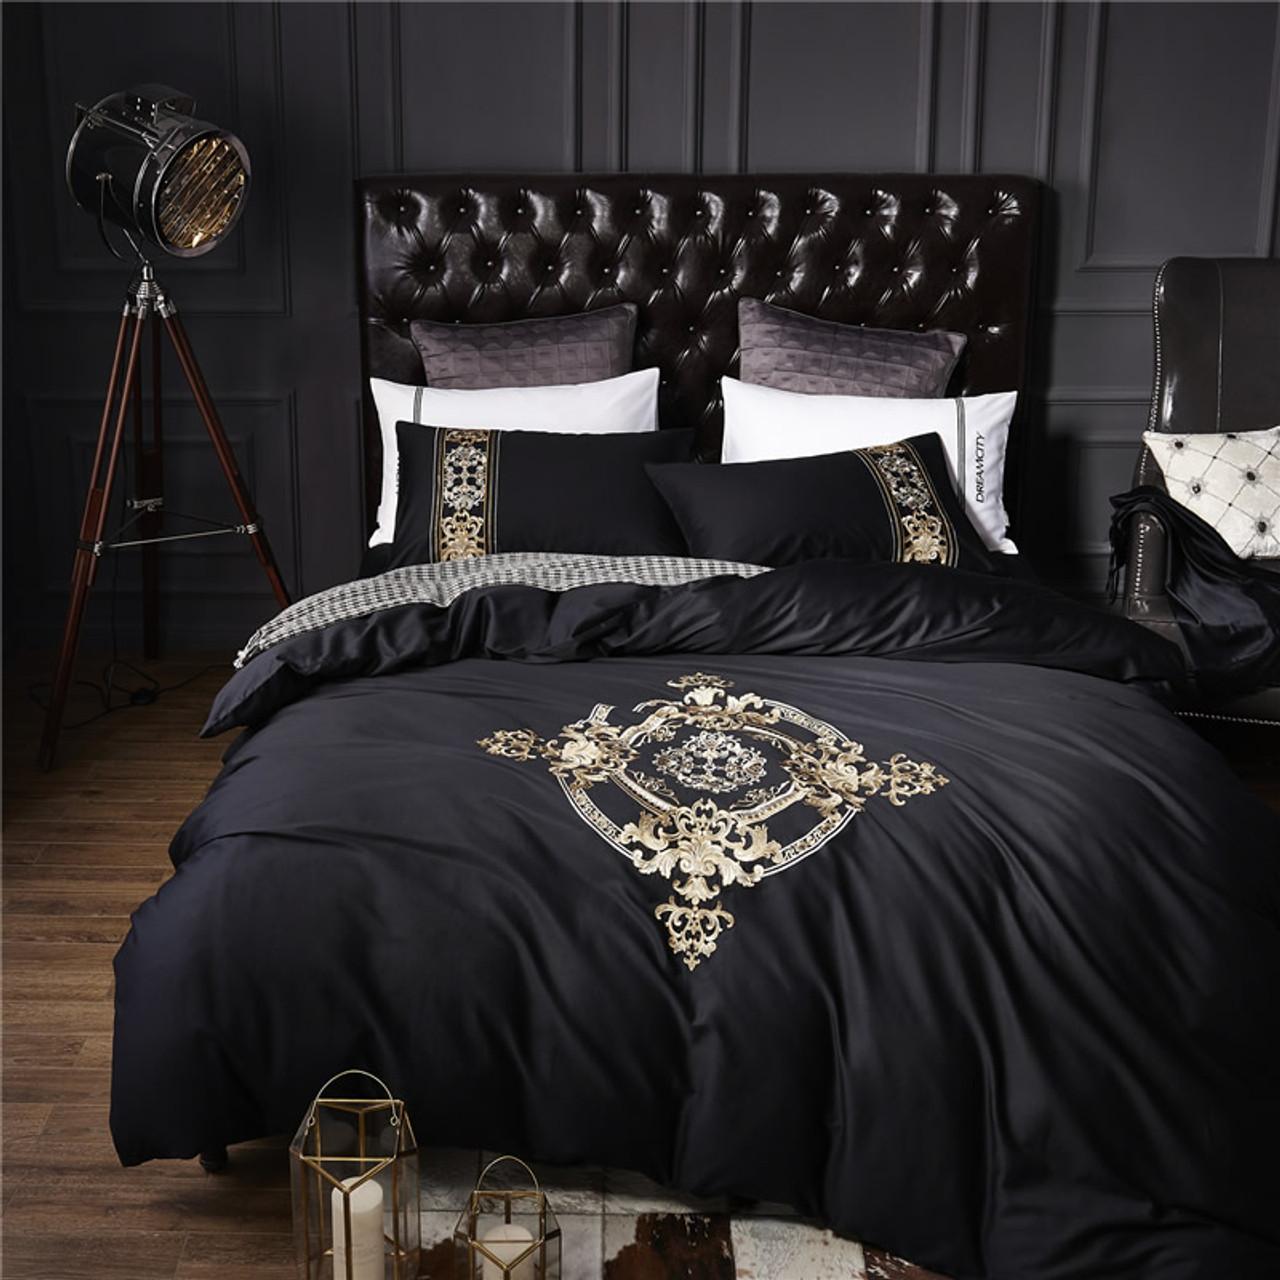 4pcs 100 Cotton Black White Silver Luxury Bedding Sets Bedclothes King Queen Size Duvet Cover Bed Sheet Linens Set Pillowcases Onshopdeals Com